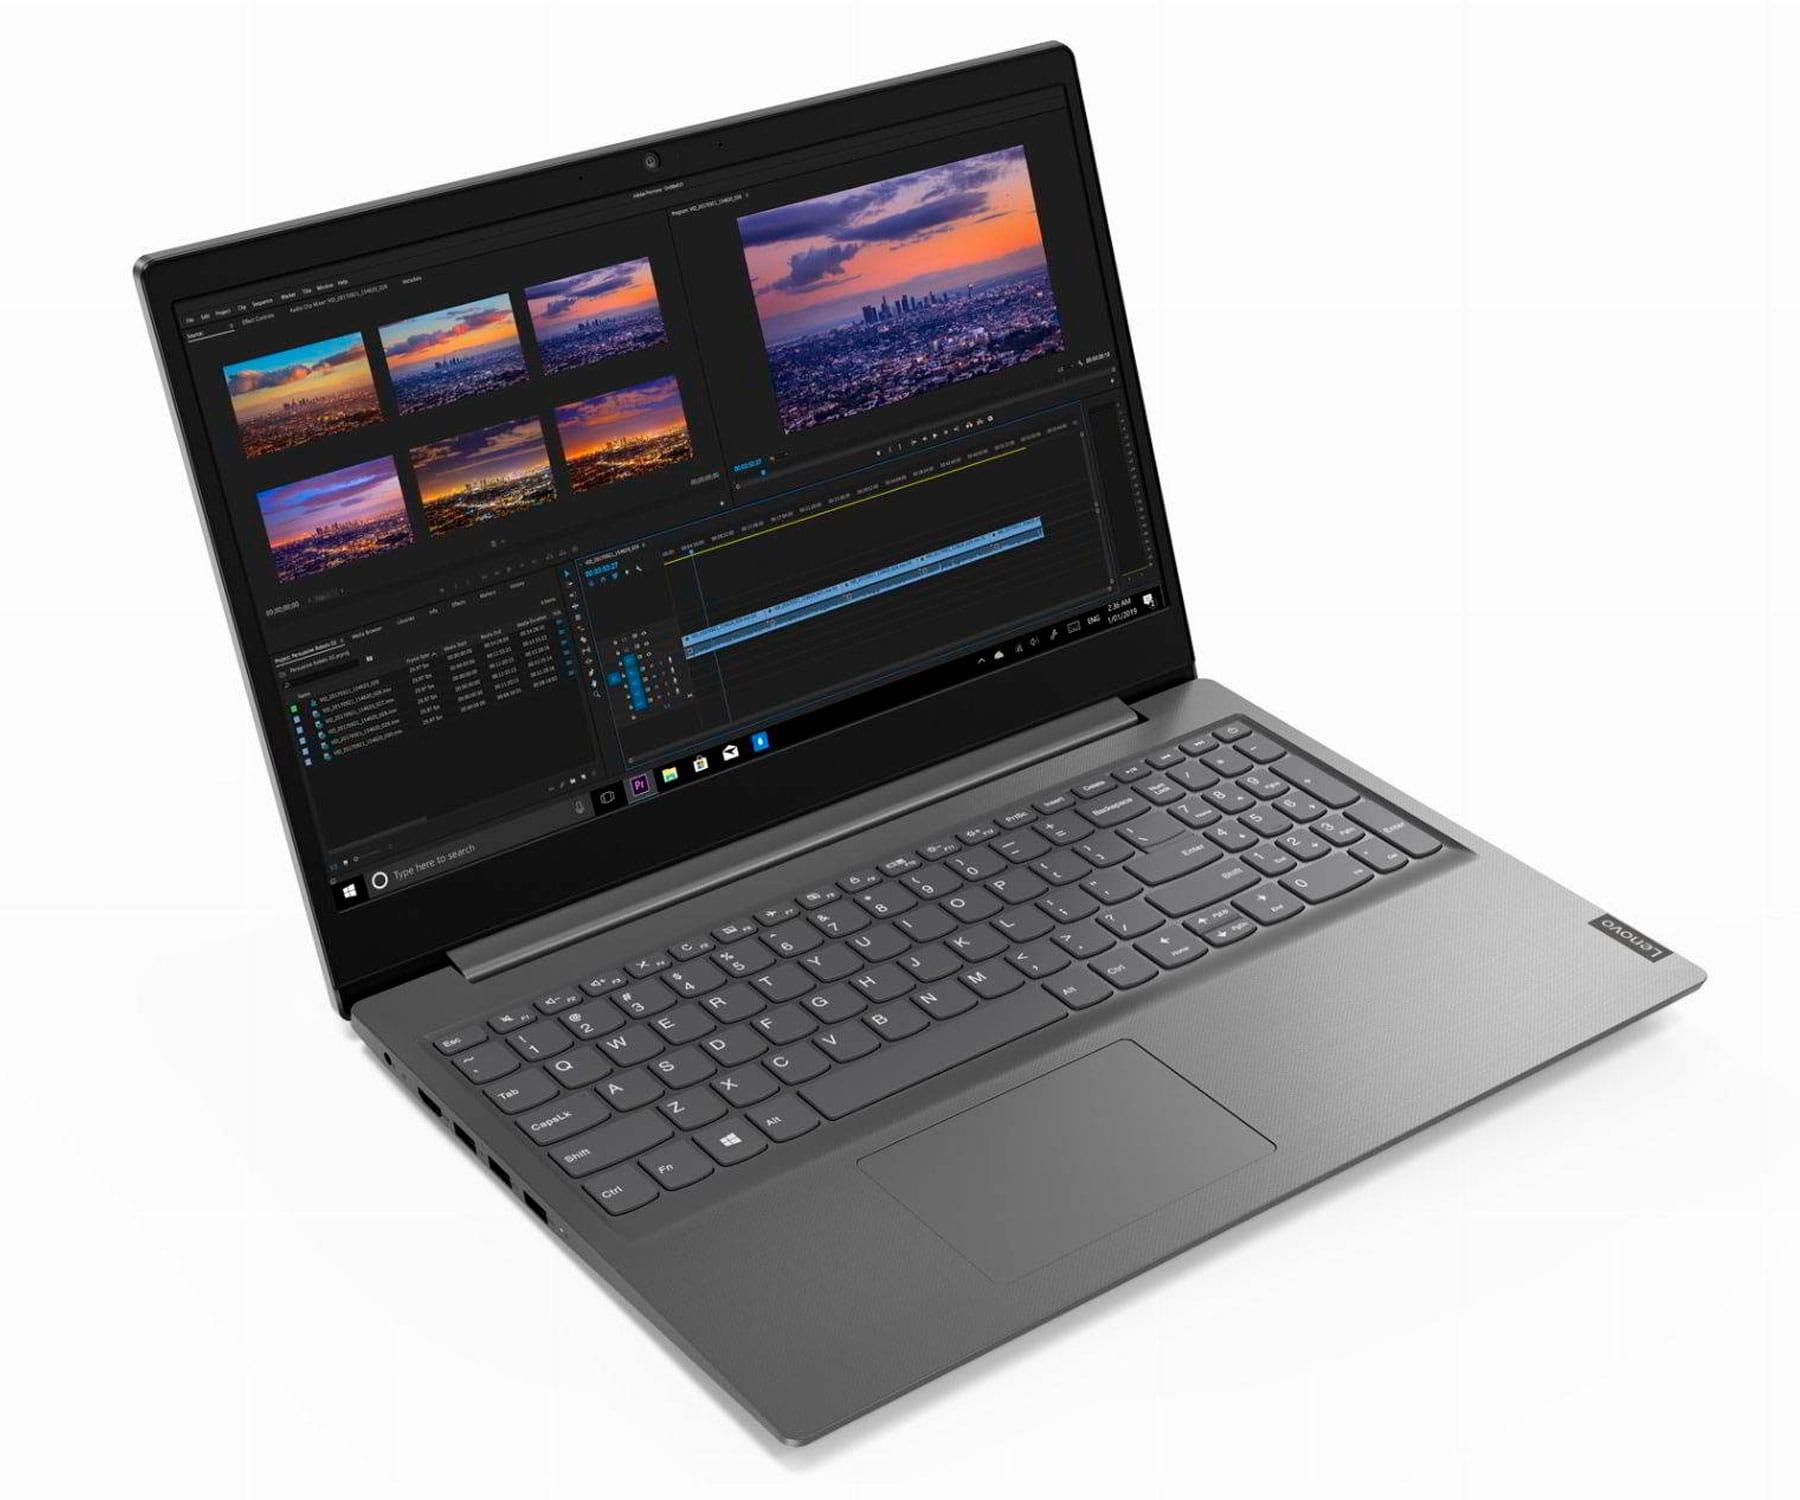 LENOVO V15-IIL GRIS PORTÁTIL 15.6'' LED HD i5-1035G1 256GB SSD 8GB RAM FREEDOS